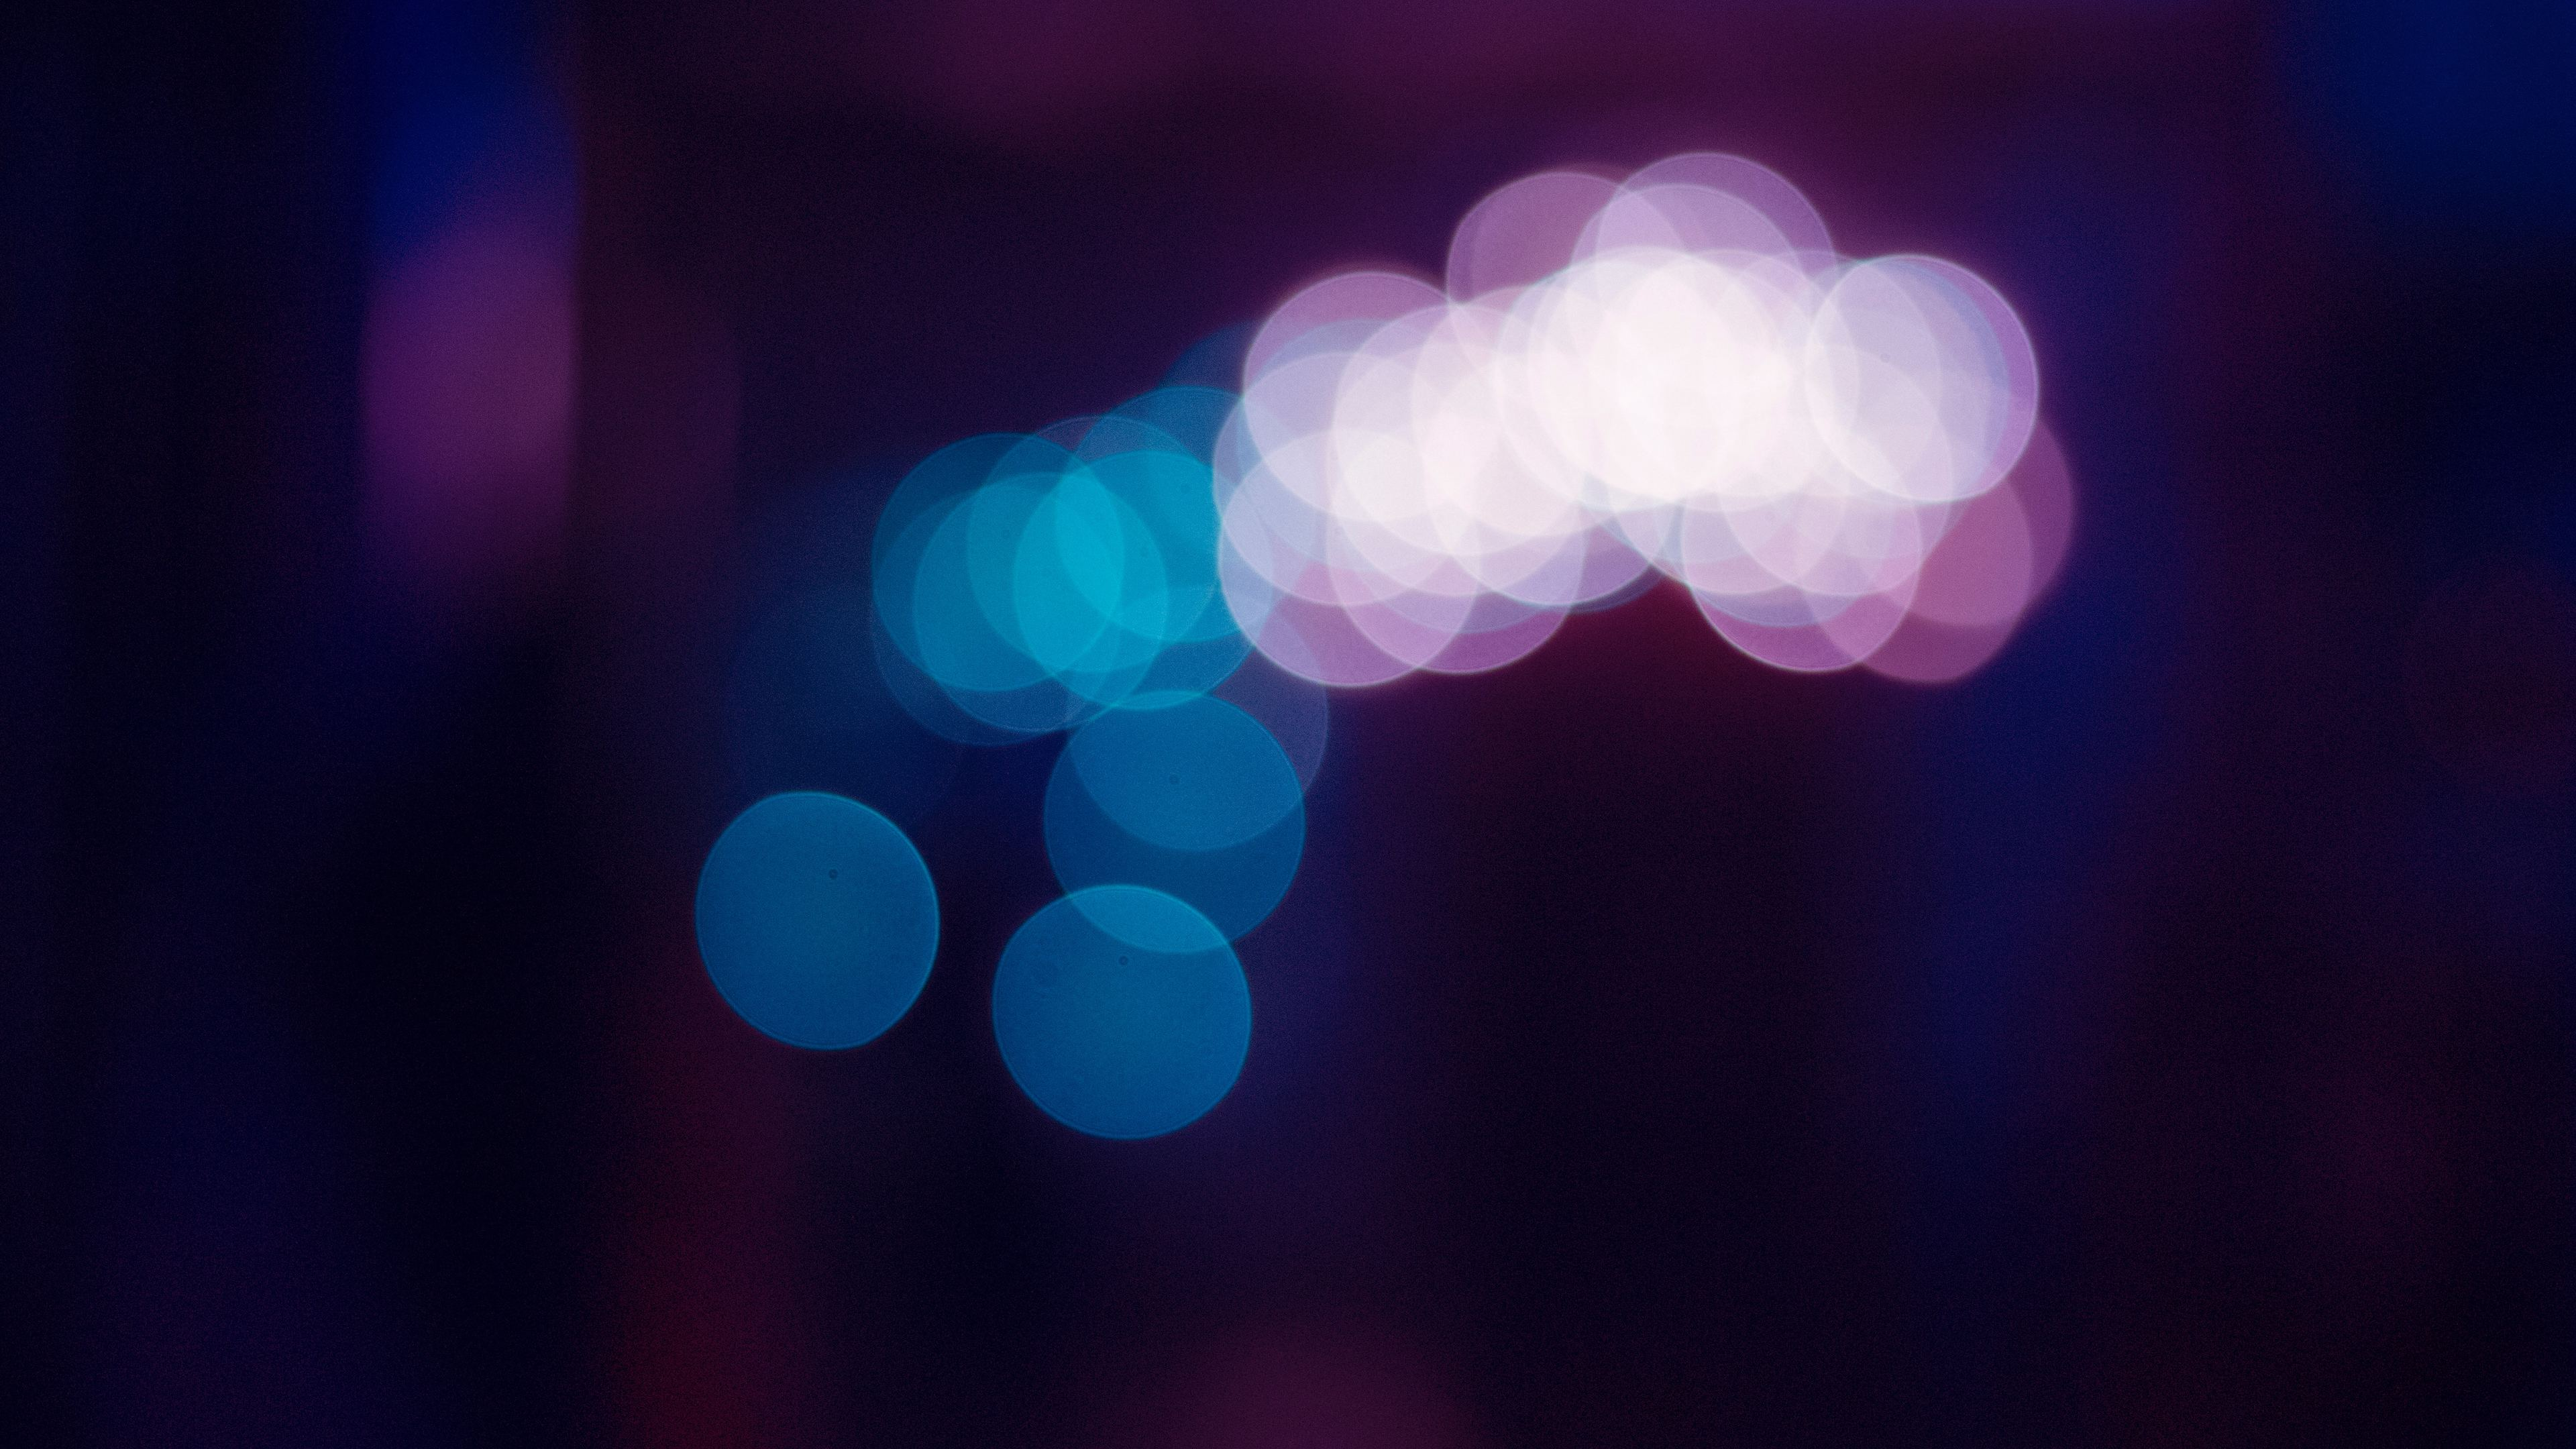 flare light abstract 4k 1553075393 - Flare Light AbstracT 4k - light wallpapers, hd-wallpapers, abstract wallpapers, 5k wallpapers, 4k-wallpapers